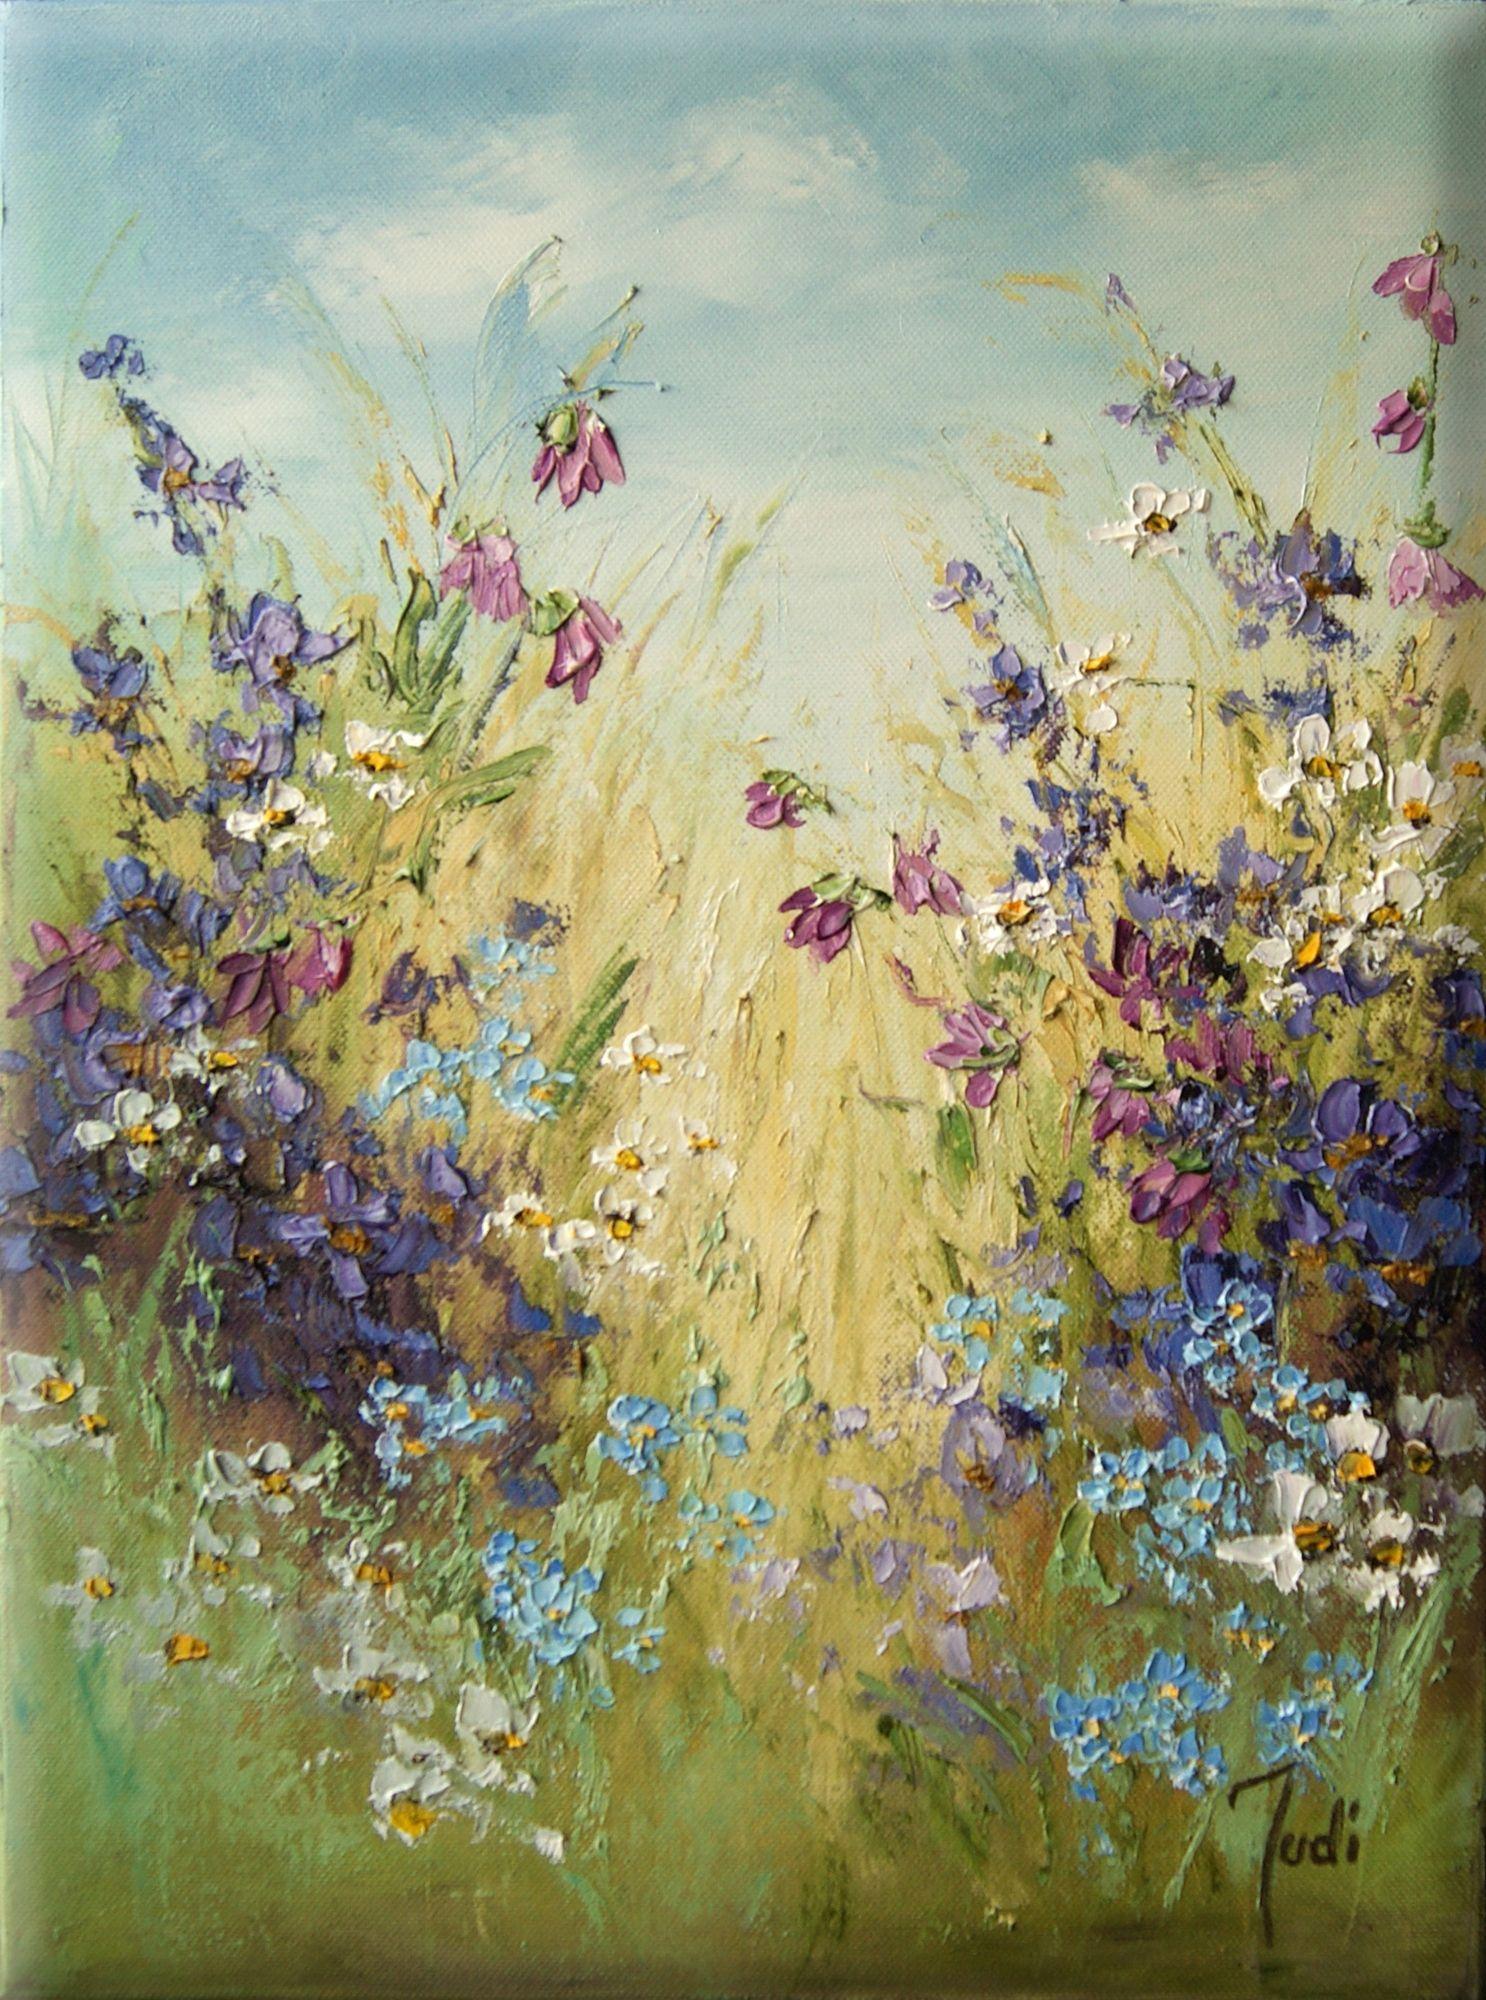 Kup Teraz Na Allegro Pl Za Judiart Obraz Olejny Kwiaty Laka Wsrod Kwiatow 9380472299 Allegro Pl Radosc Amazing Art Painting Floral Painting Painting